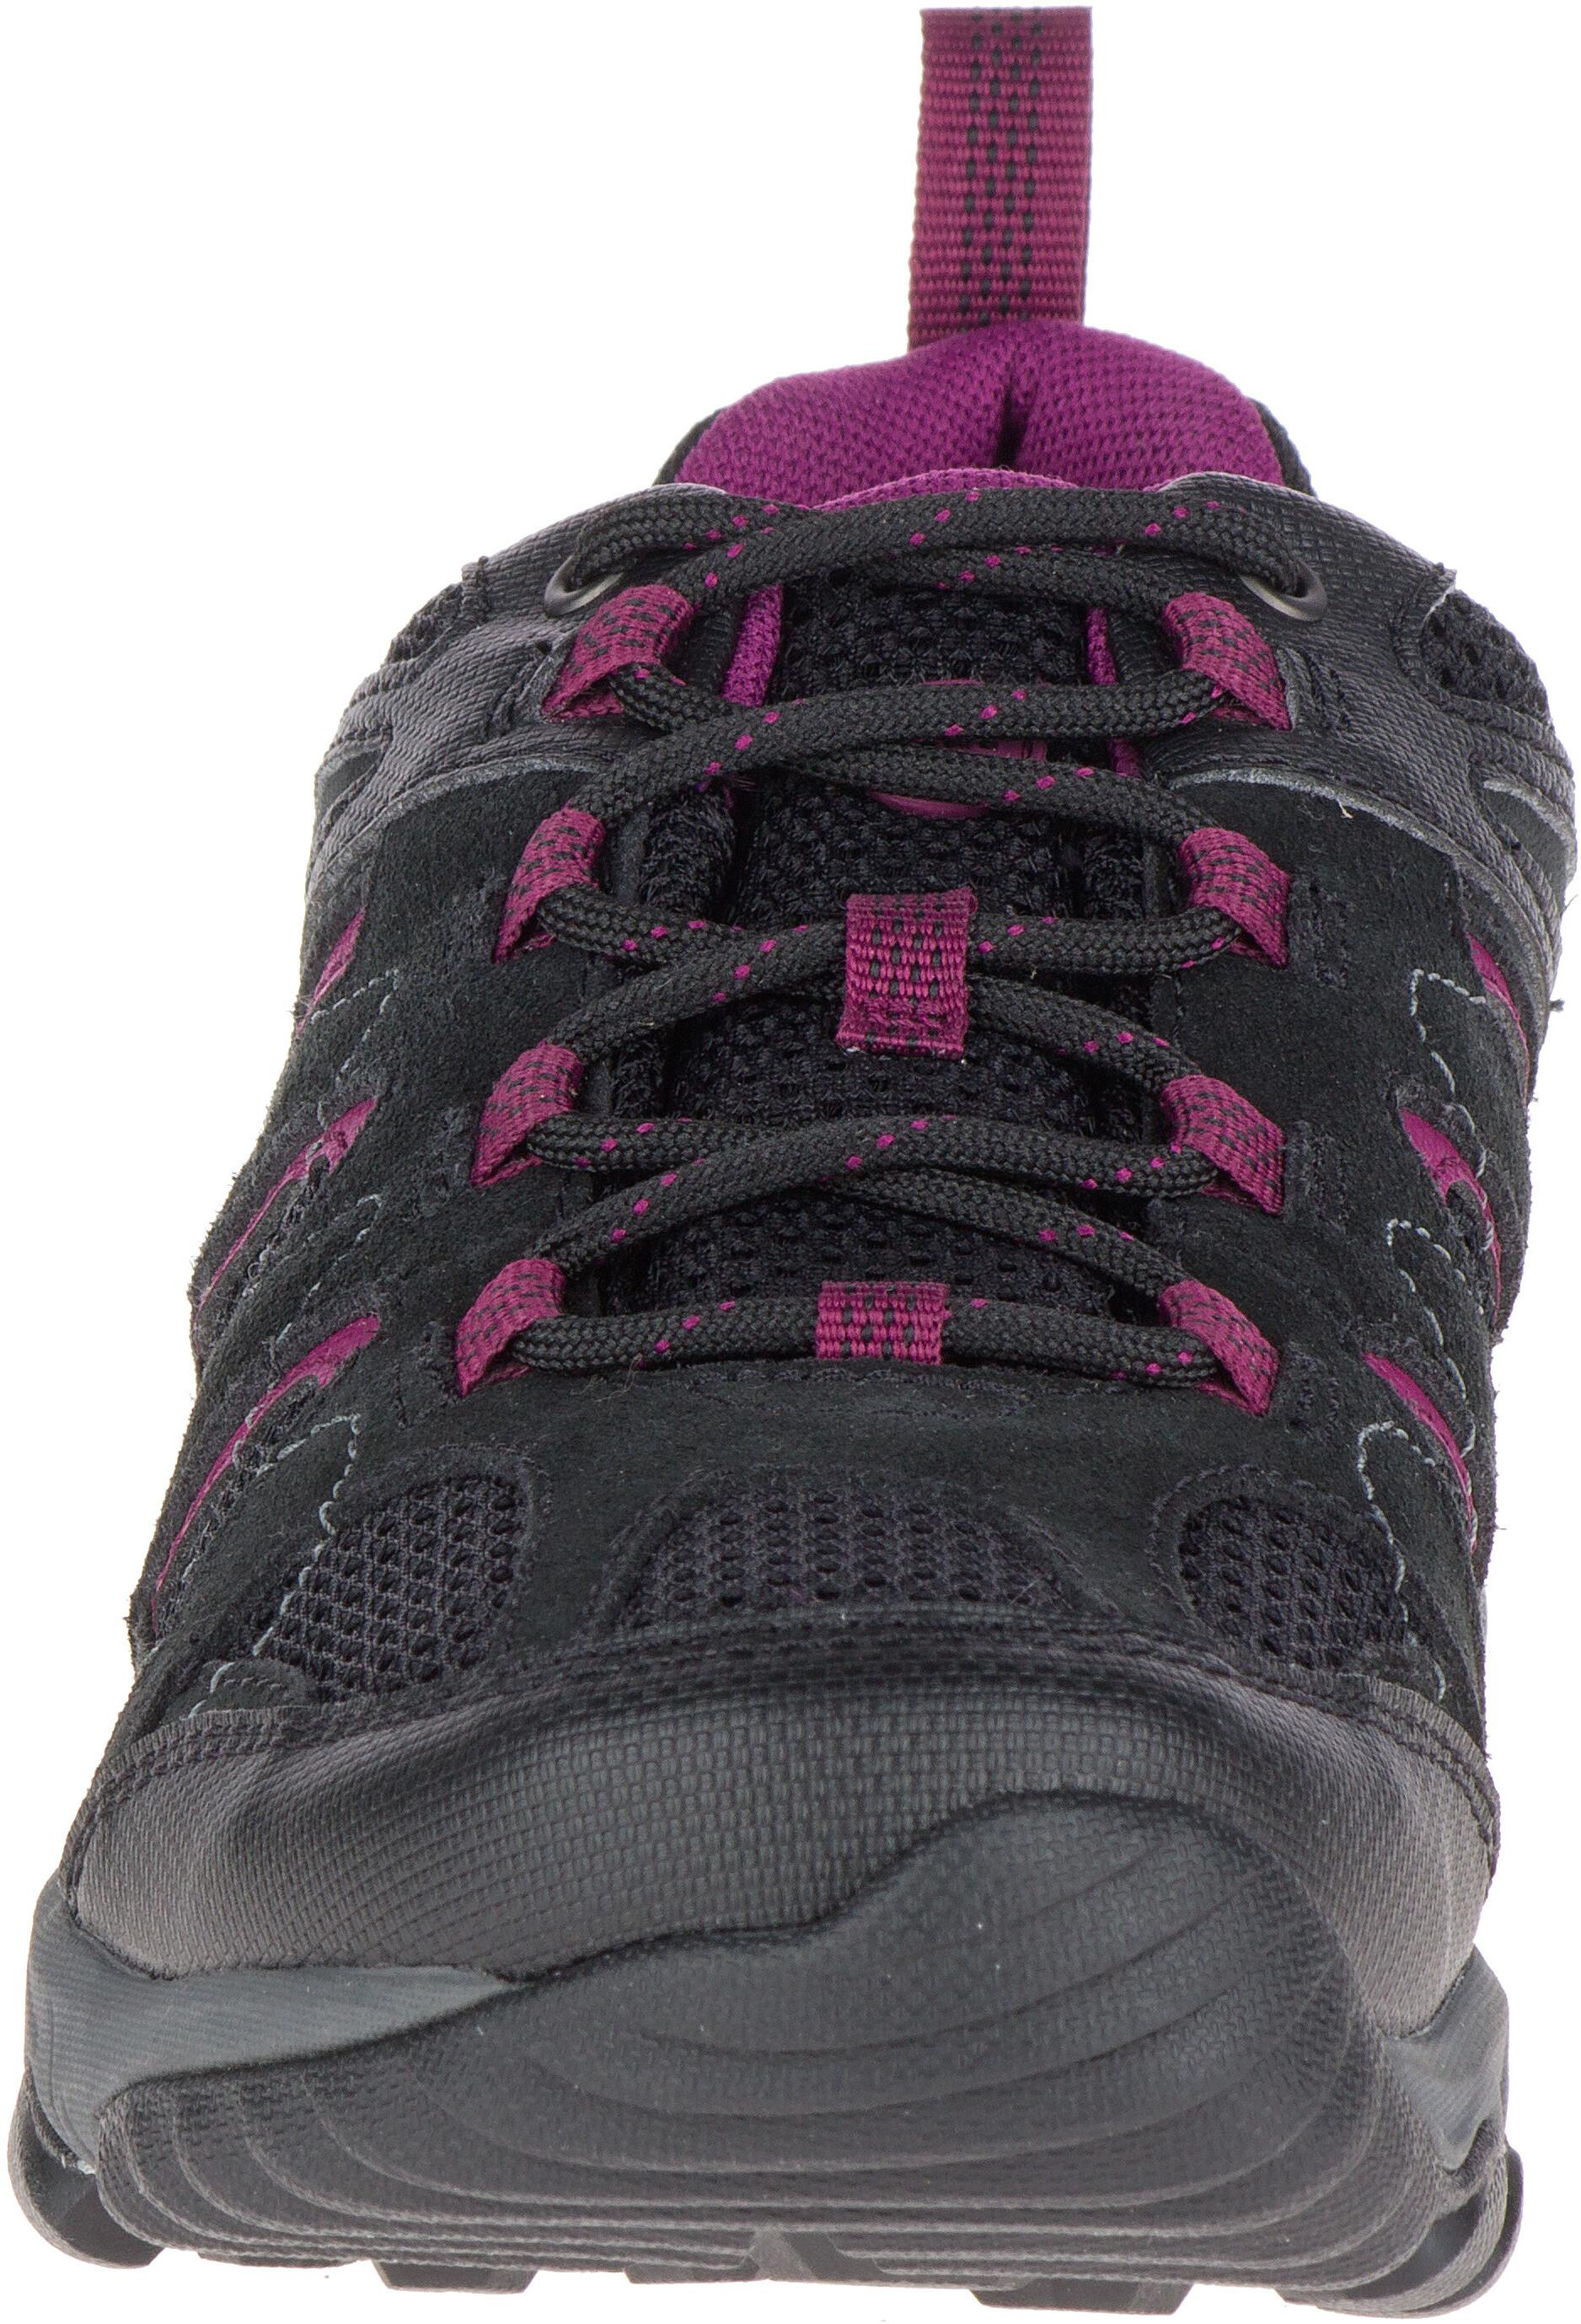 Merrell Outmost Vent GTX - Chaussures Femme - noir sur CAMPZ ! 8671dcfc197